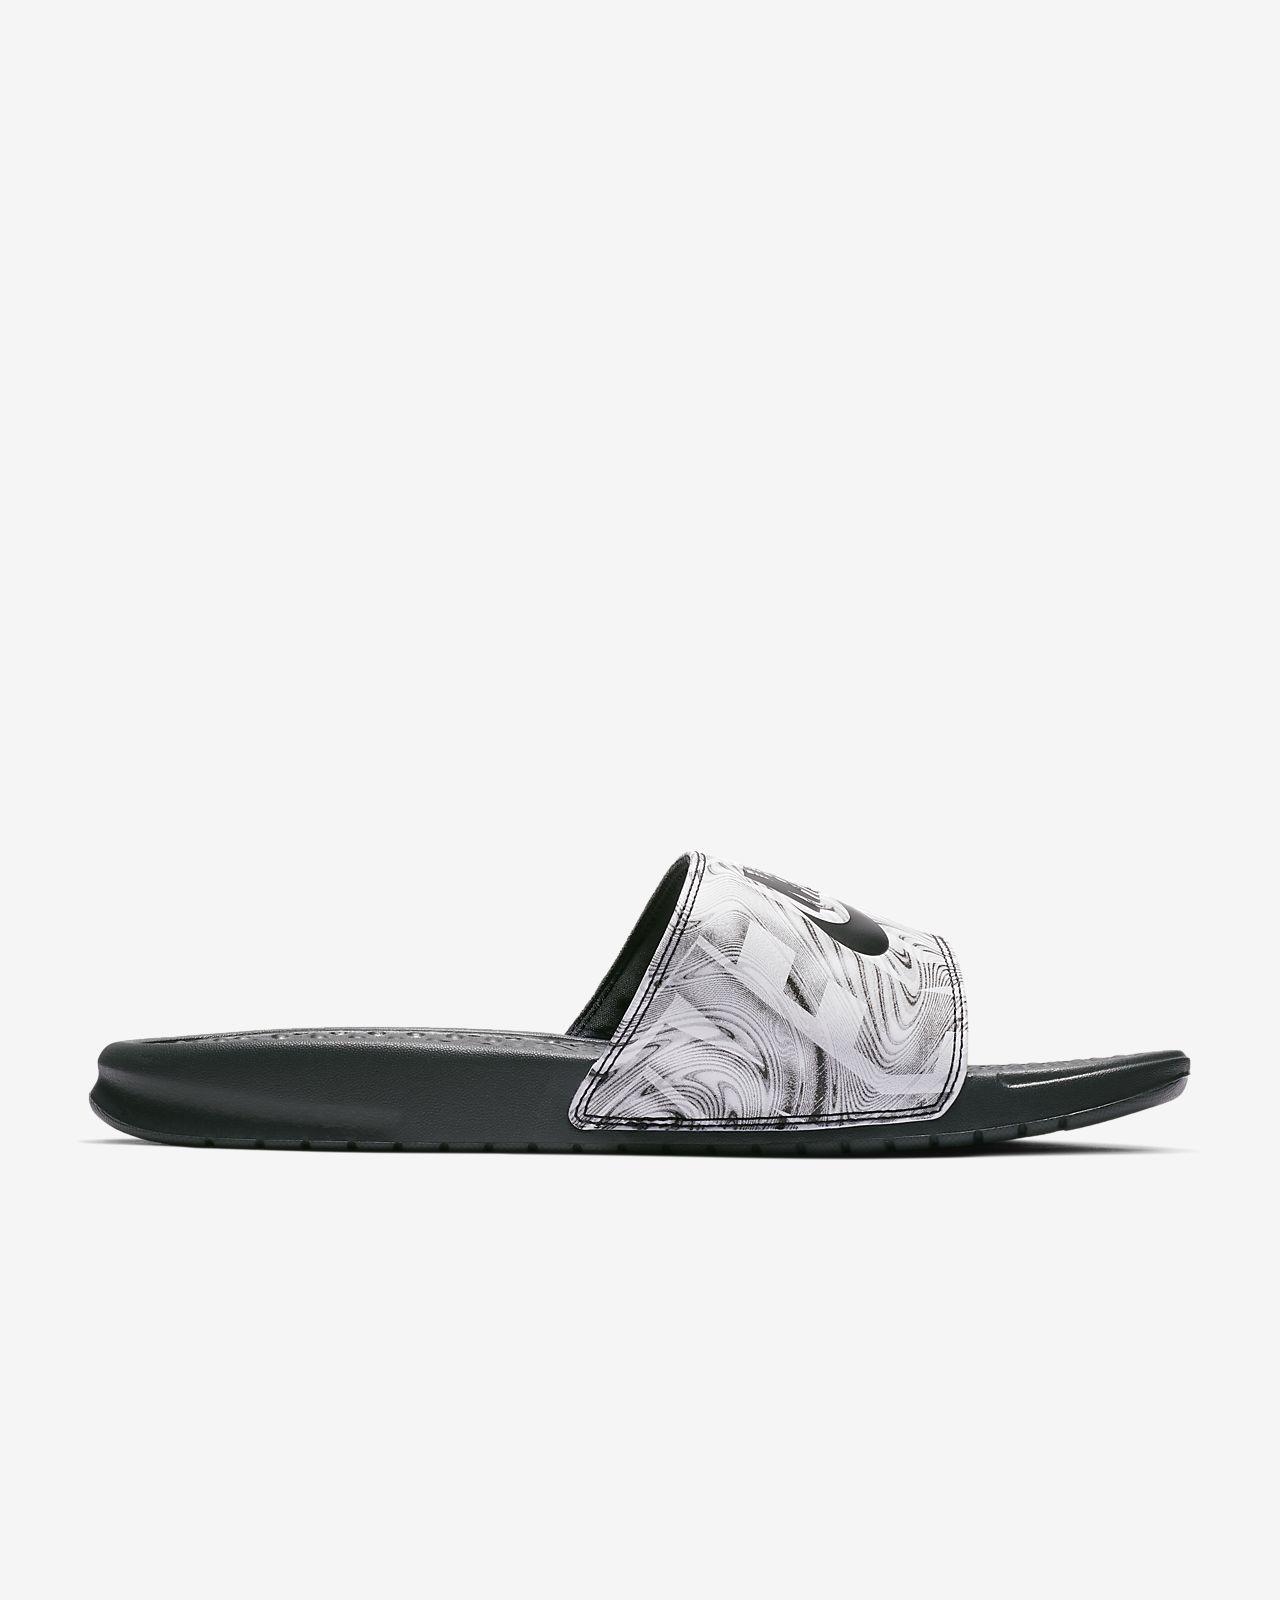 Benassi Homme Marron Nike Sandales Printed Vm0nnw8o JlF1cKu3T